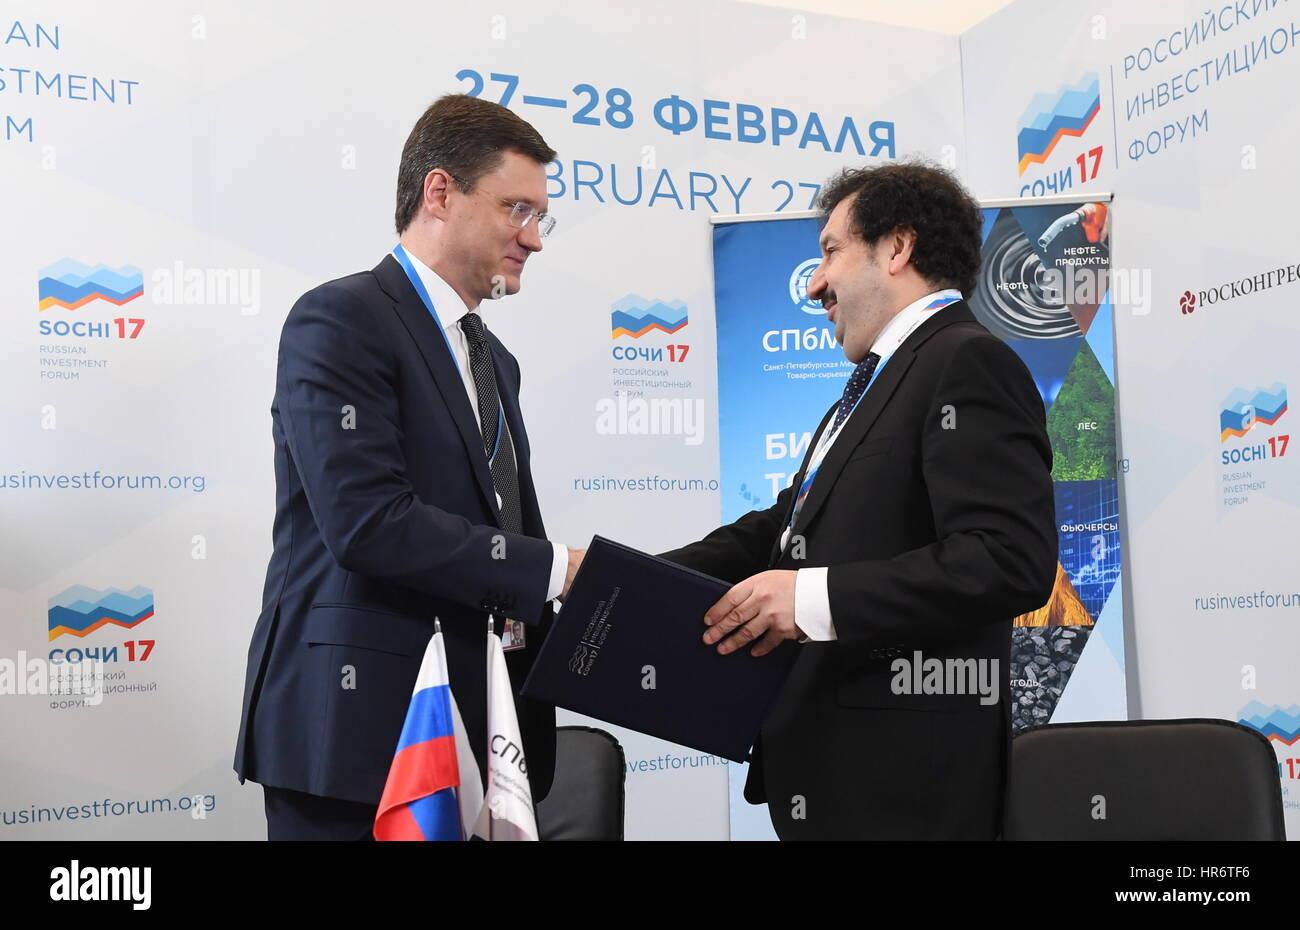 Alexander Mau sochi, russia. 27th feb, 2017. russia's energy minister